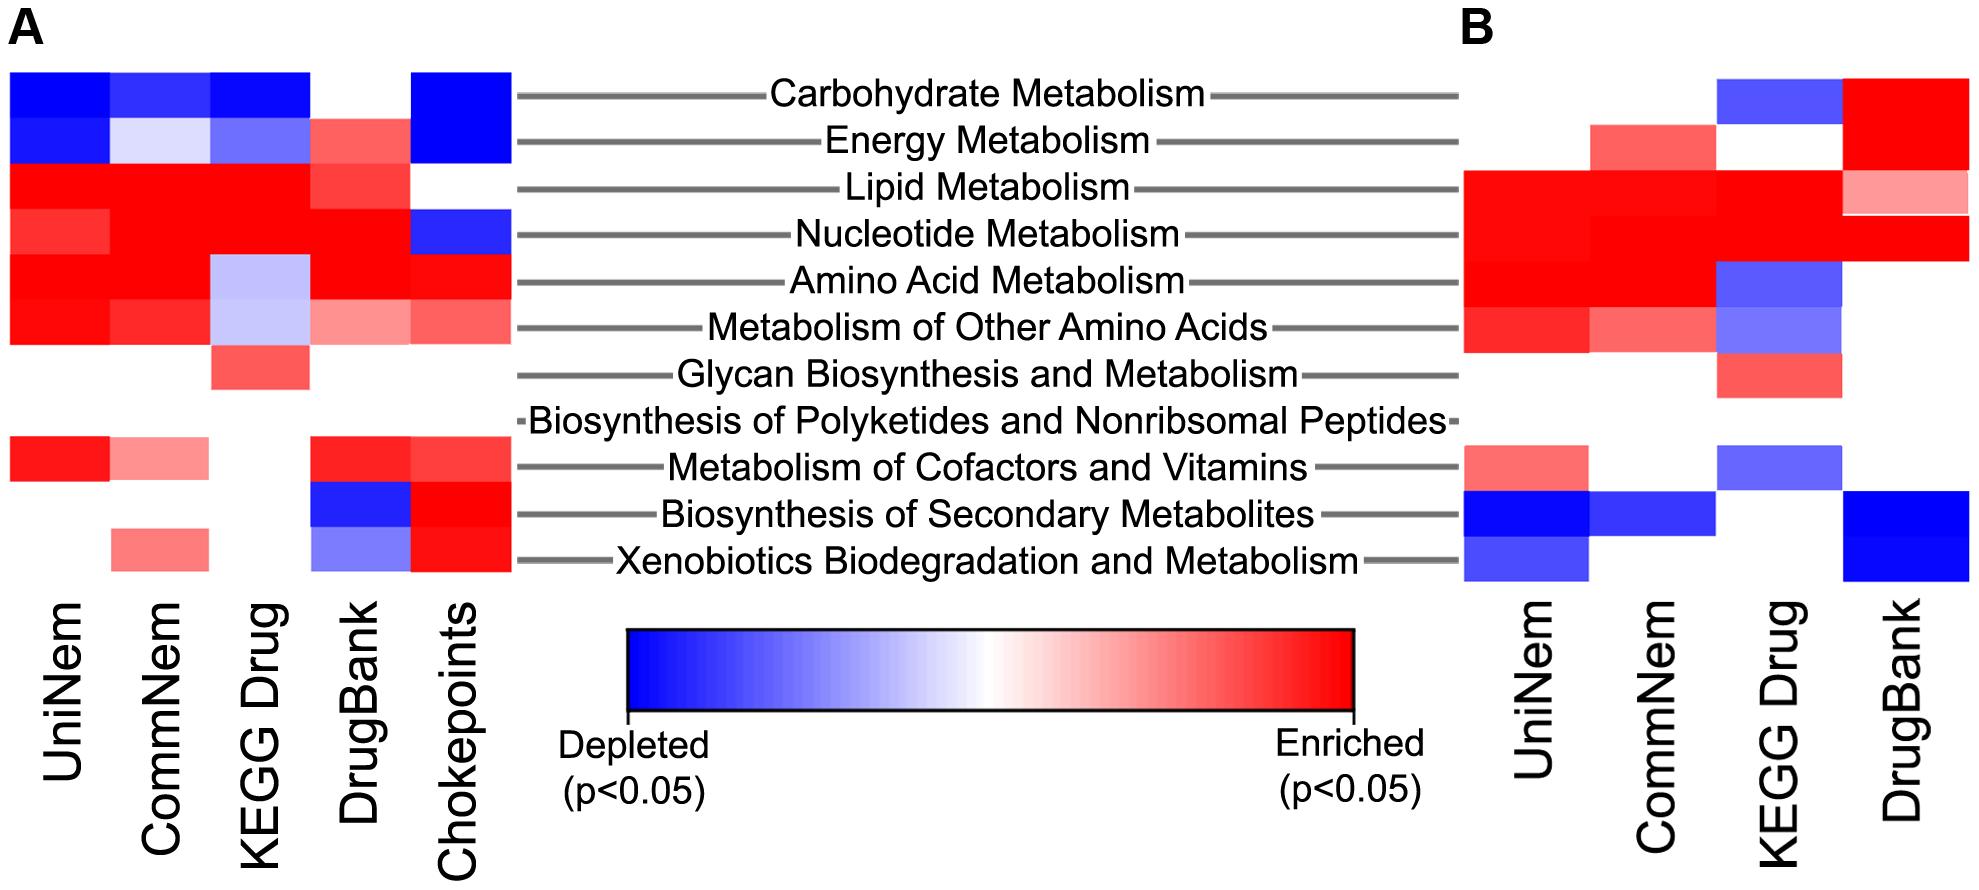 Heatmap indicating enriched and depleted KEGG metabolic pathways.